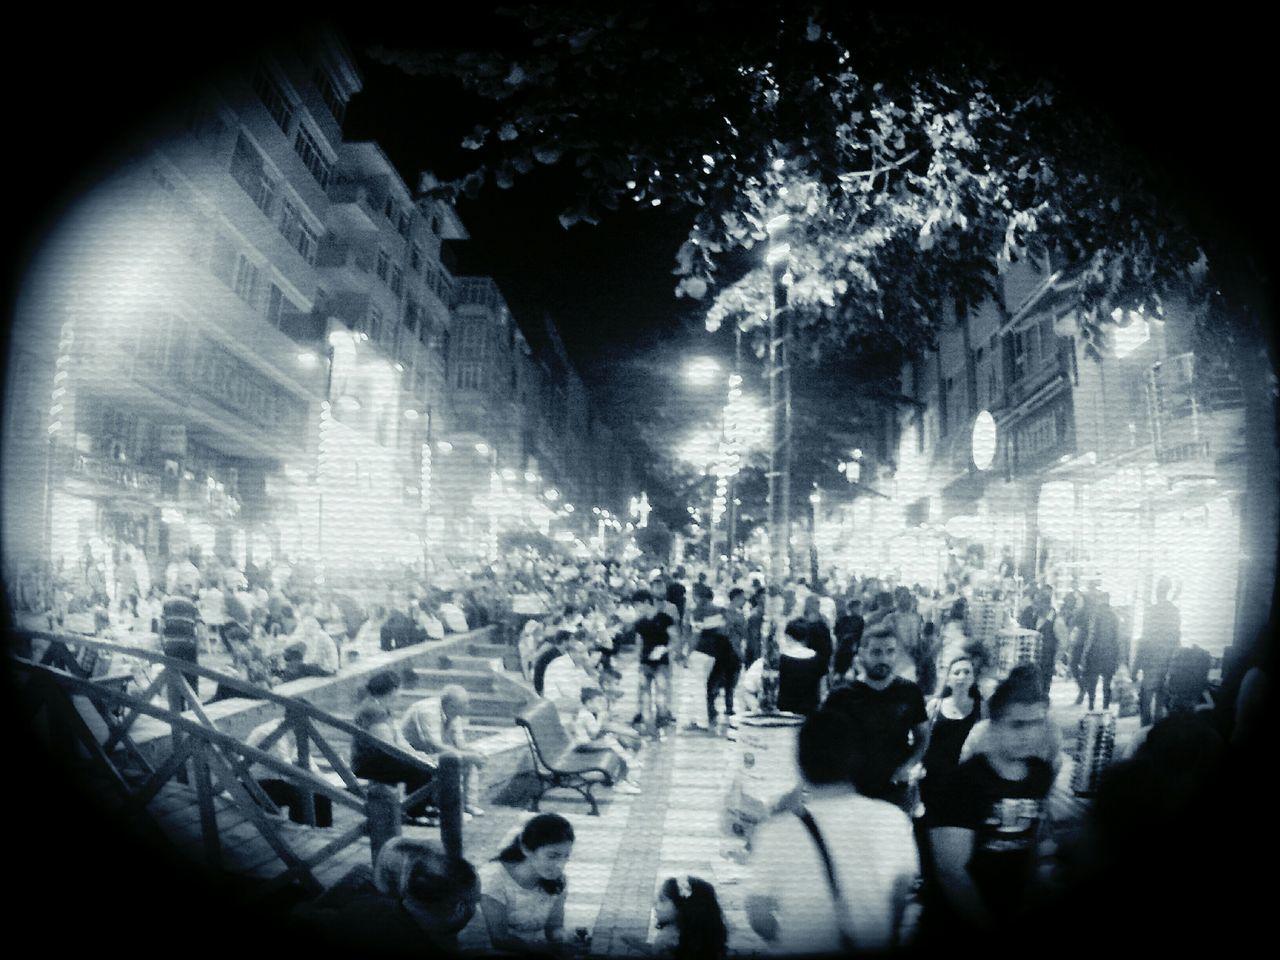 Ramadan in Istanbul. Last day of Ramadan and everybody shopping for tomorrow, the holly day of Islam. Ramadan Nights Street Photography Street Crowd Crowded